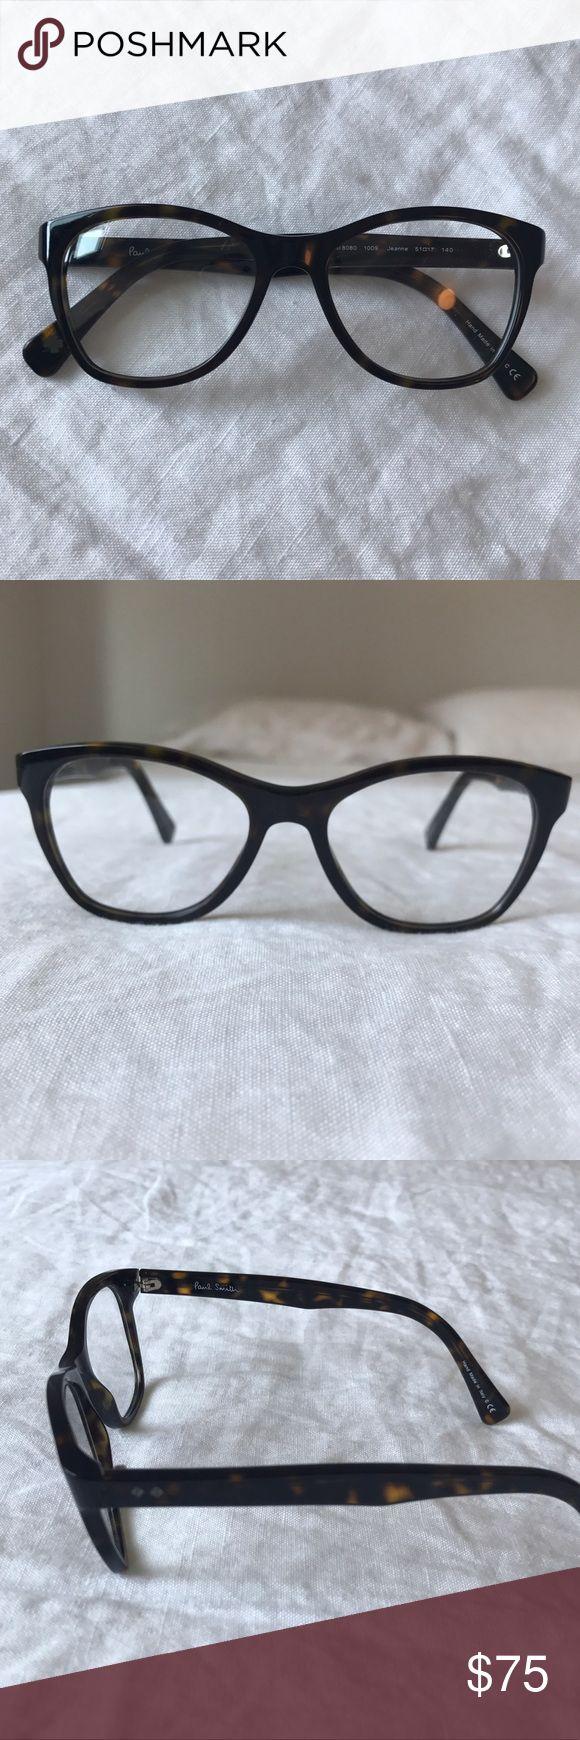 Glasses Frames Too Small : Best 20+ Tortoise Color ideas on Pinterest